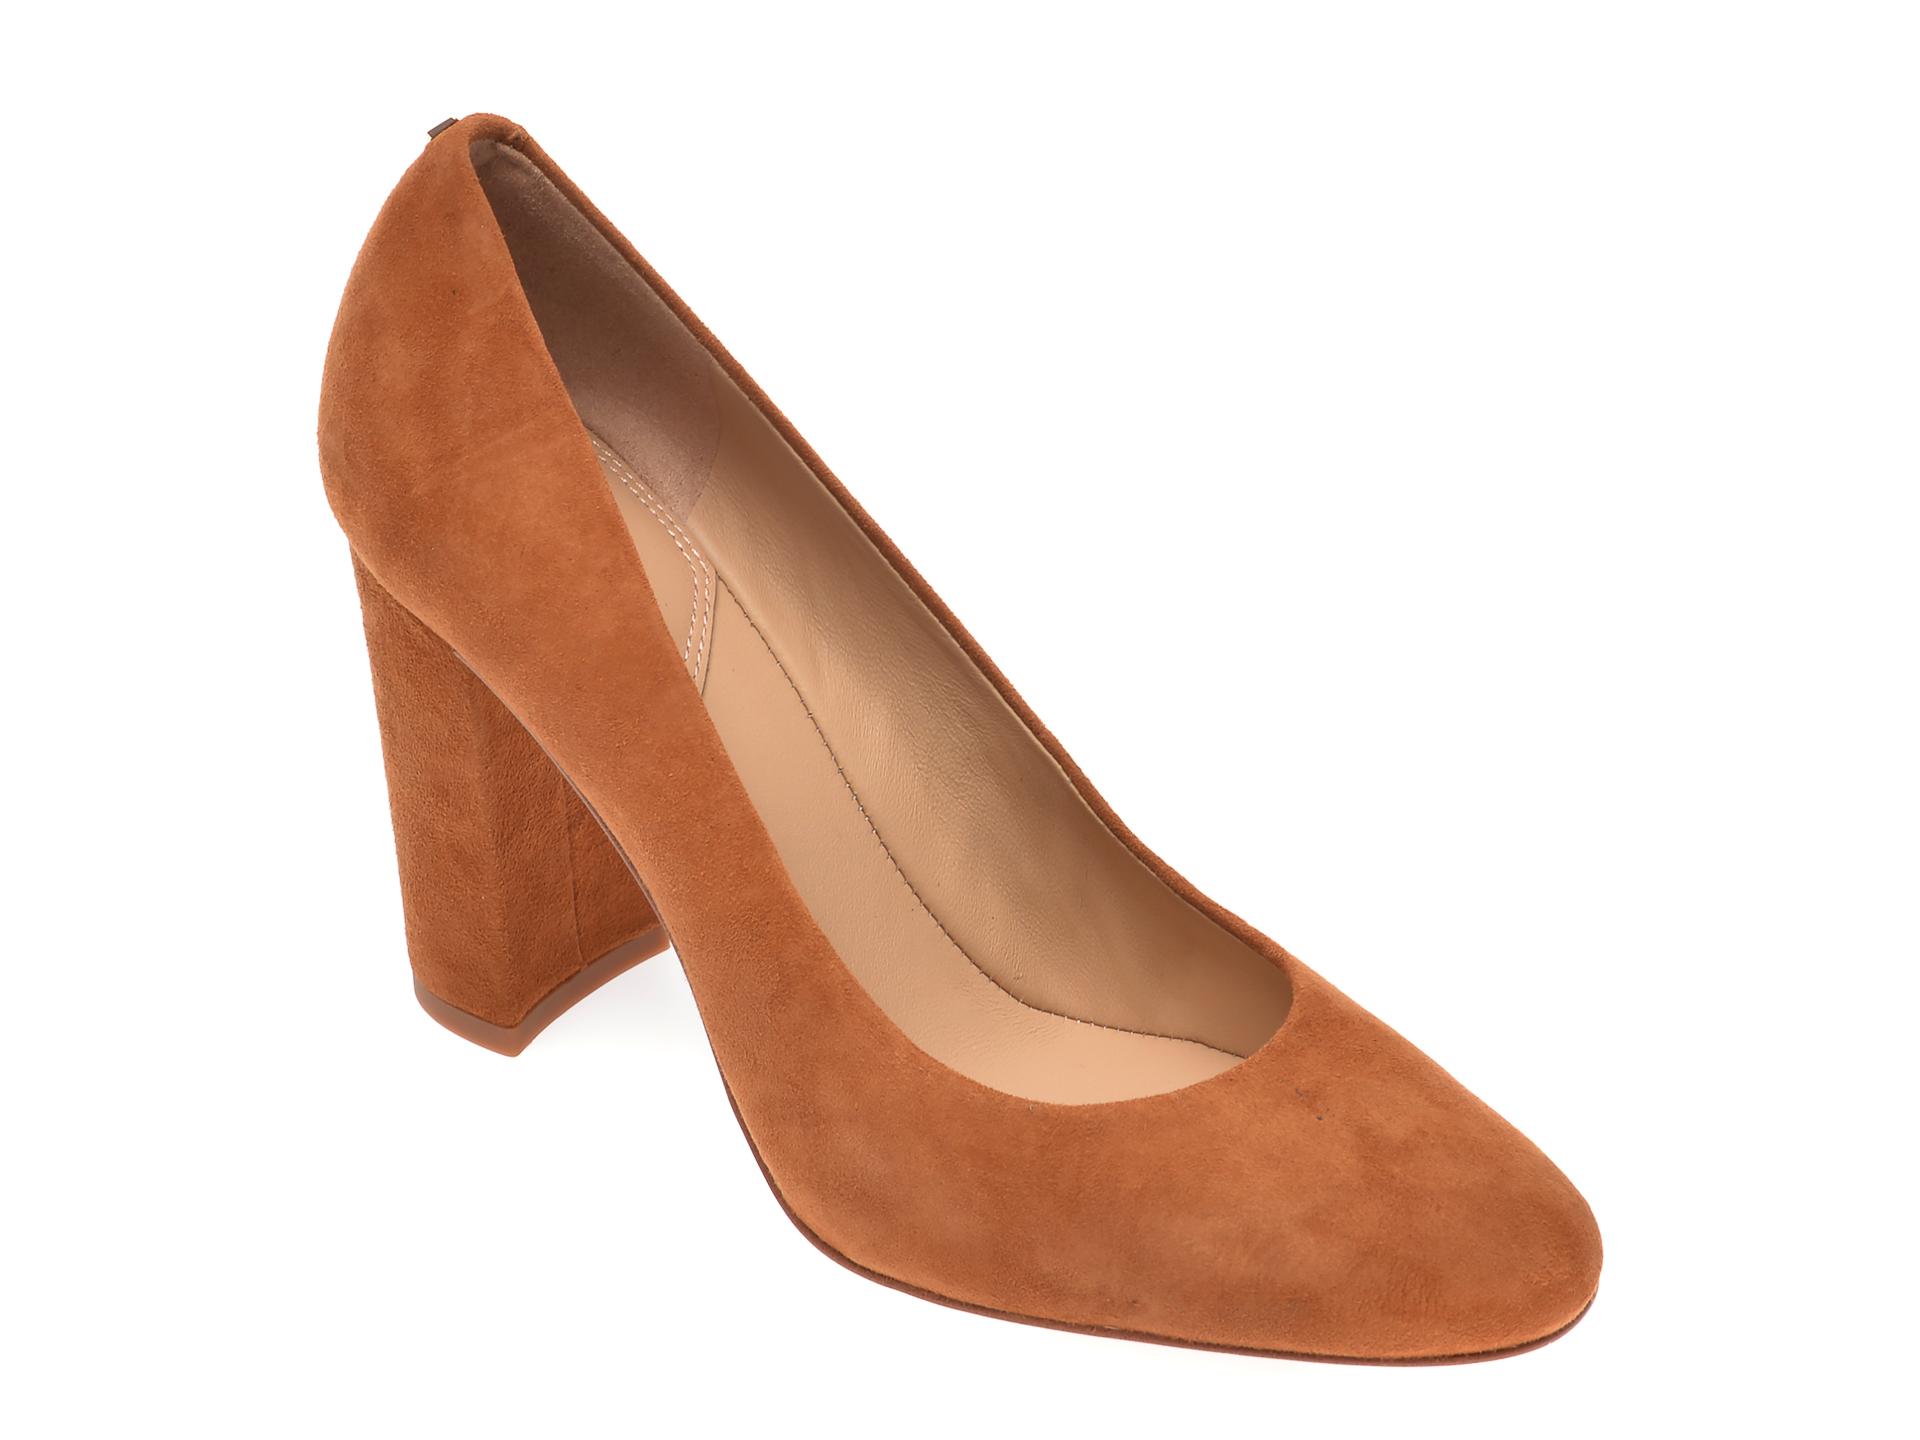 Pantofi ALDO maro, Aurelline210, din piele intoarsa